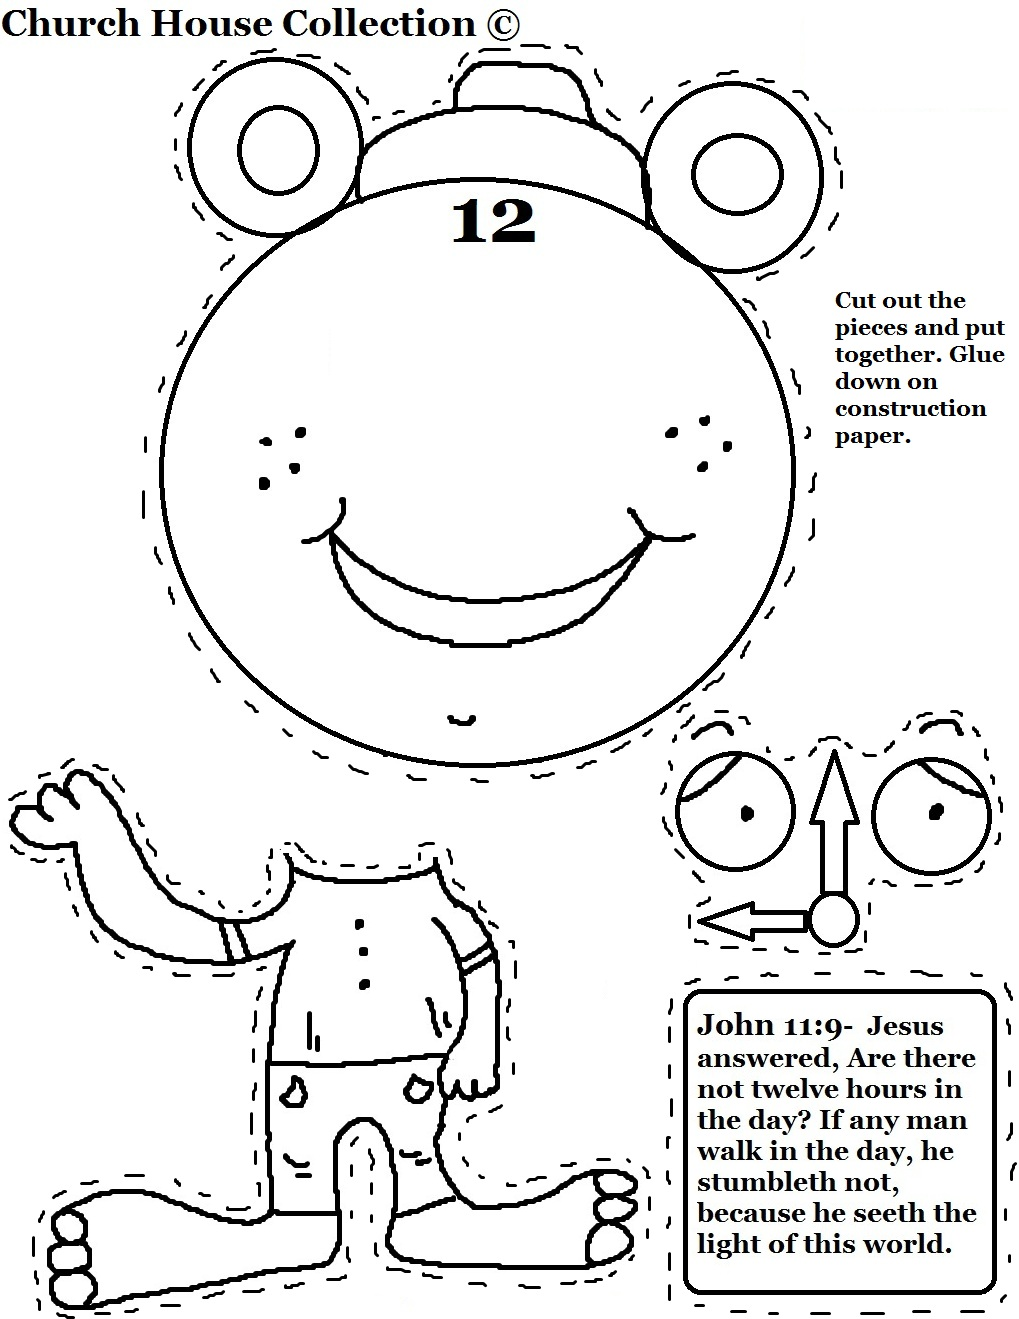 Daylight Savings Time Sunday School Lesson